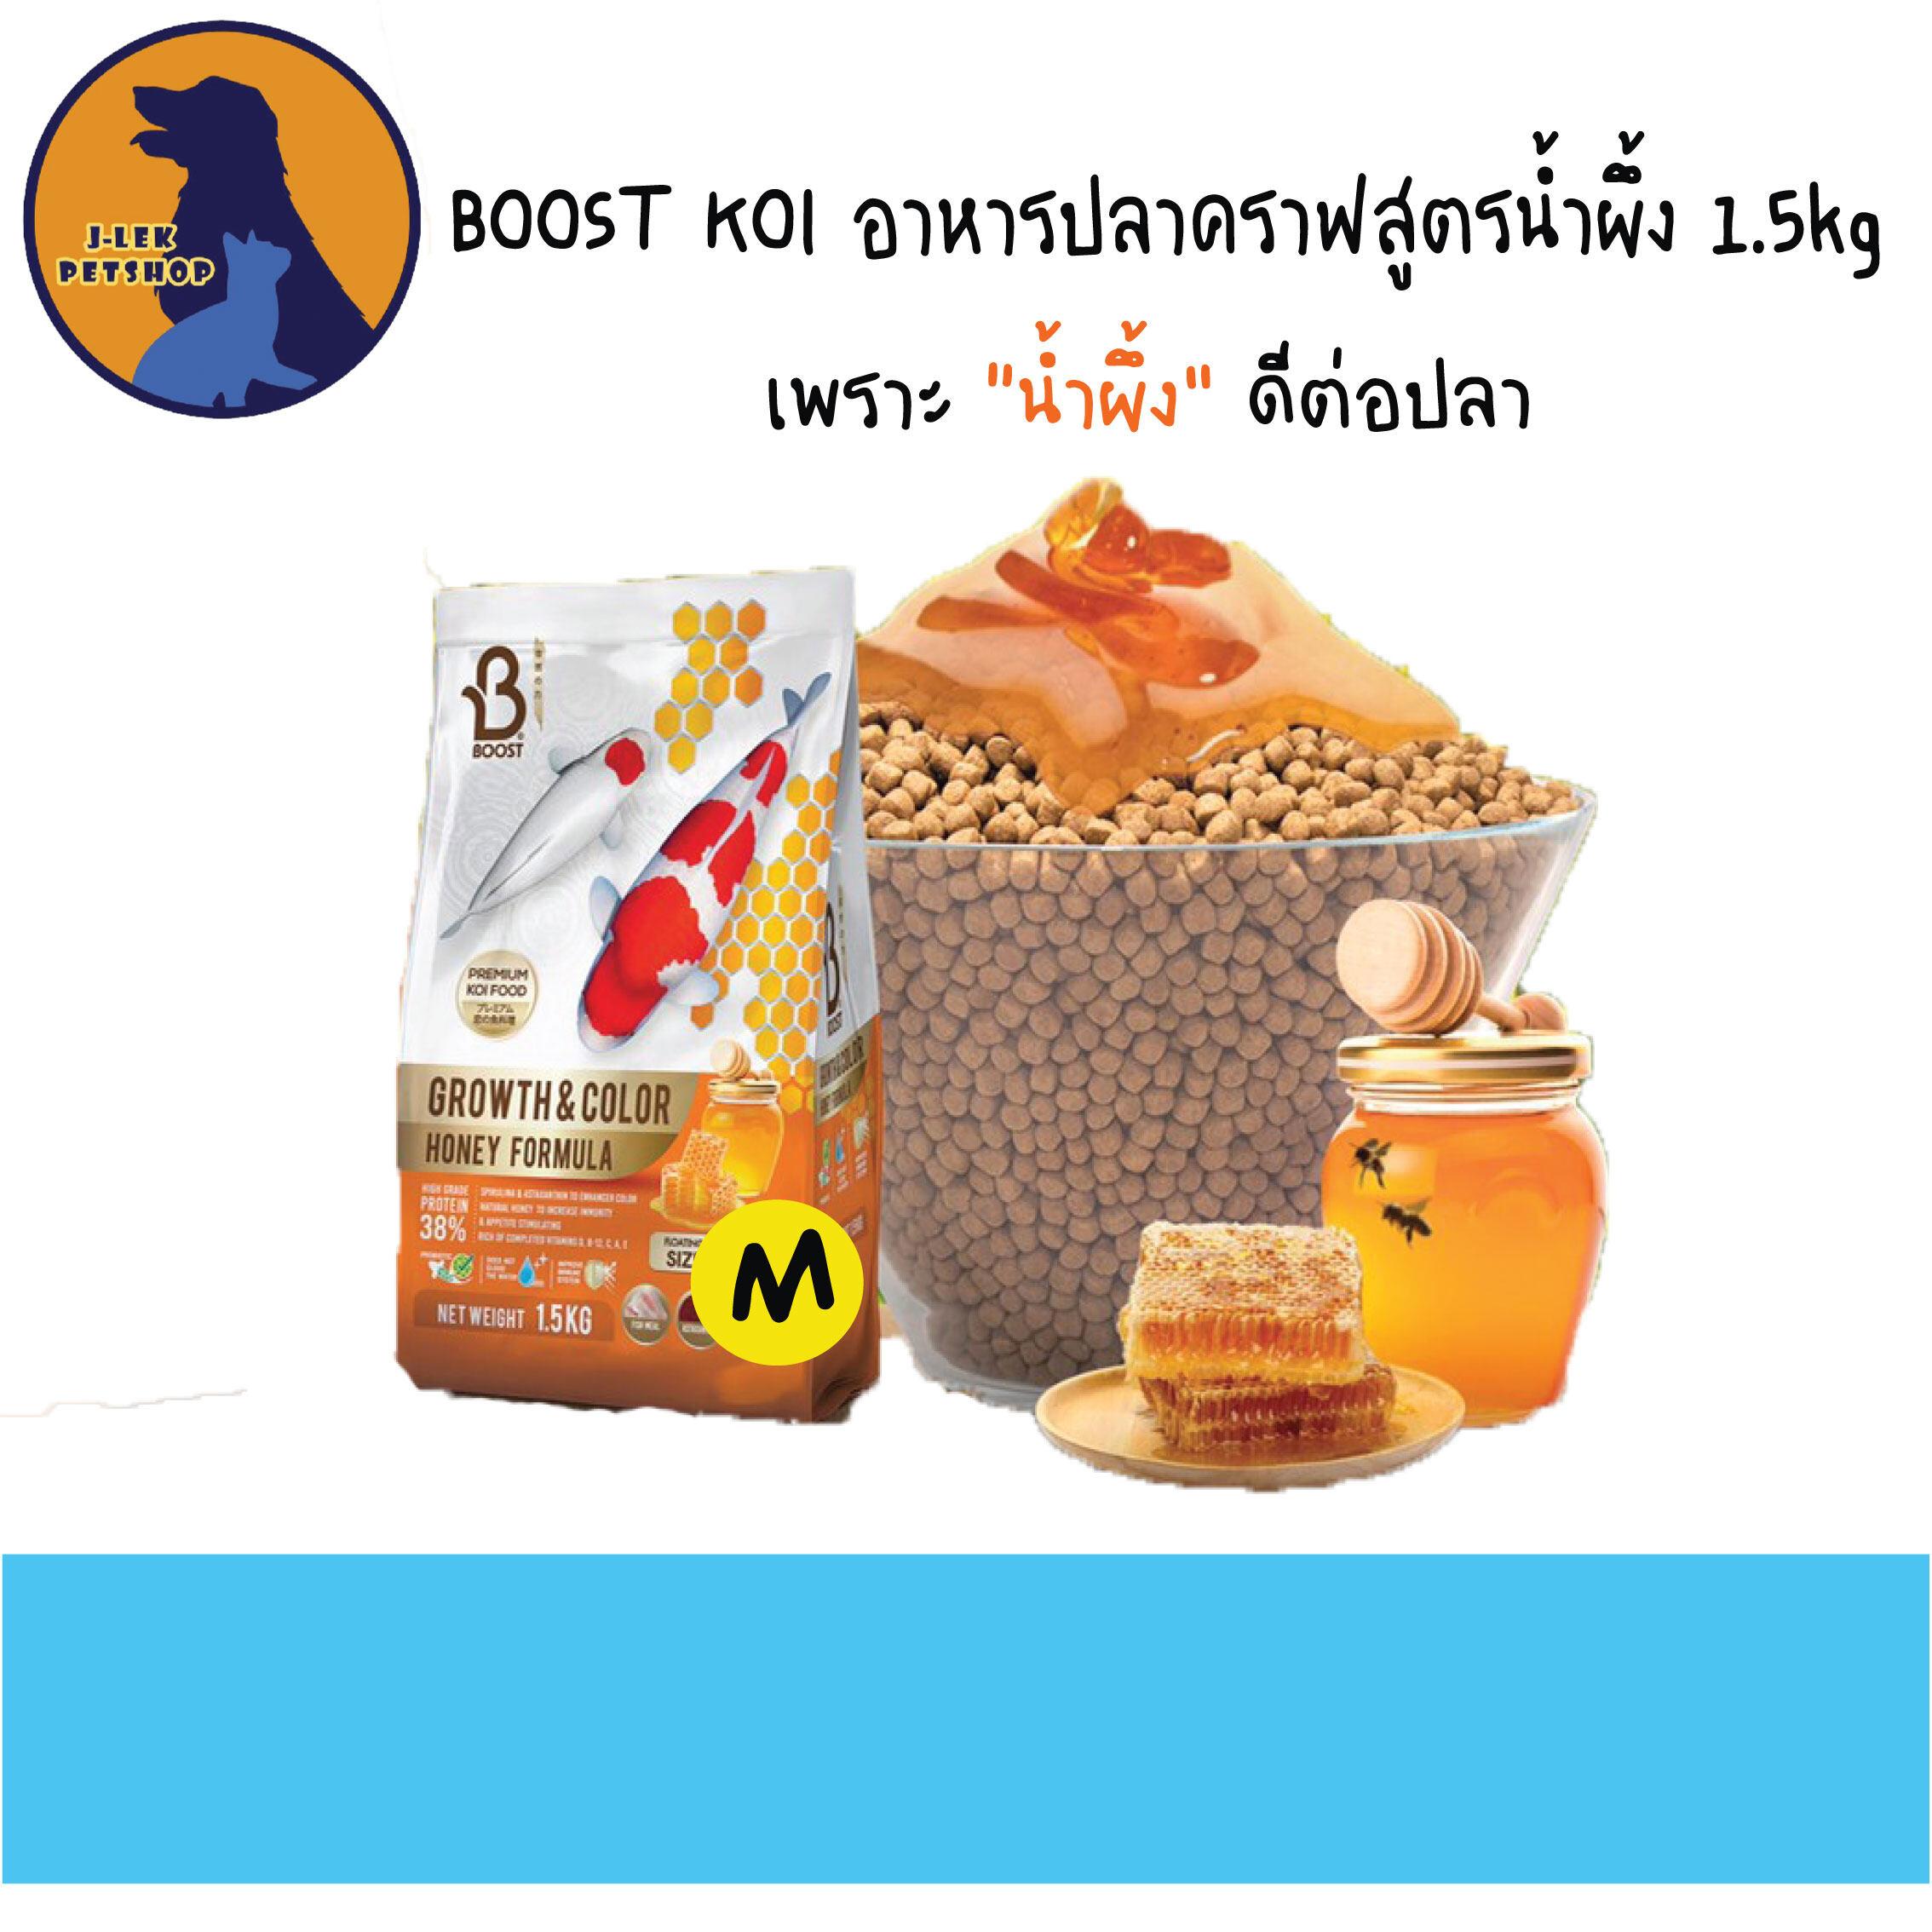 Boost Koi Growth & Color Honey Formula 1.5kg อาหารปลาคาร์ฟสูตรน้ำผึ้ง เร่งโต เร่งสี เม็ดกลาง 1.5kg